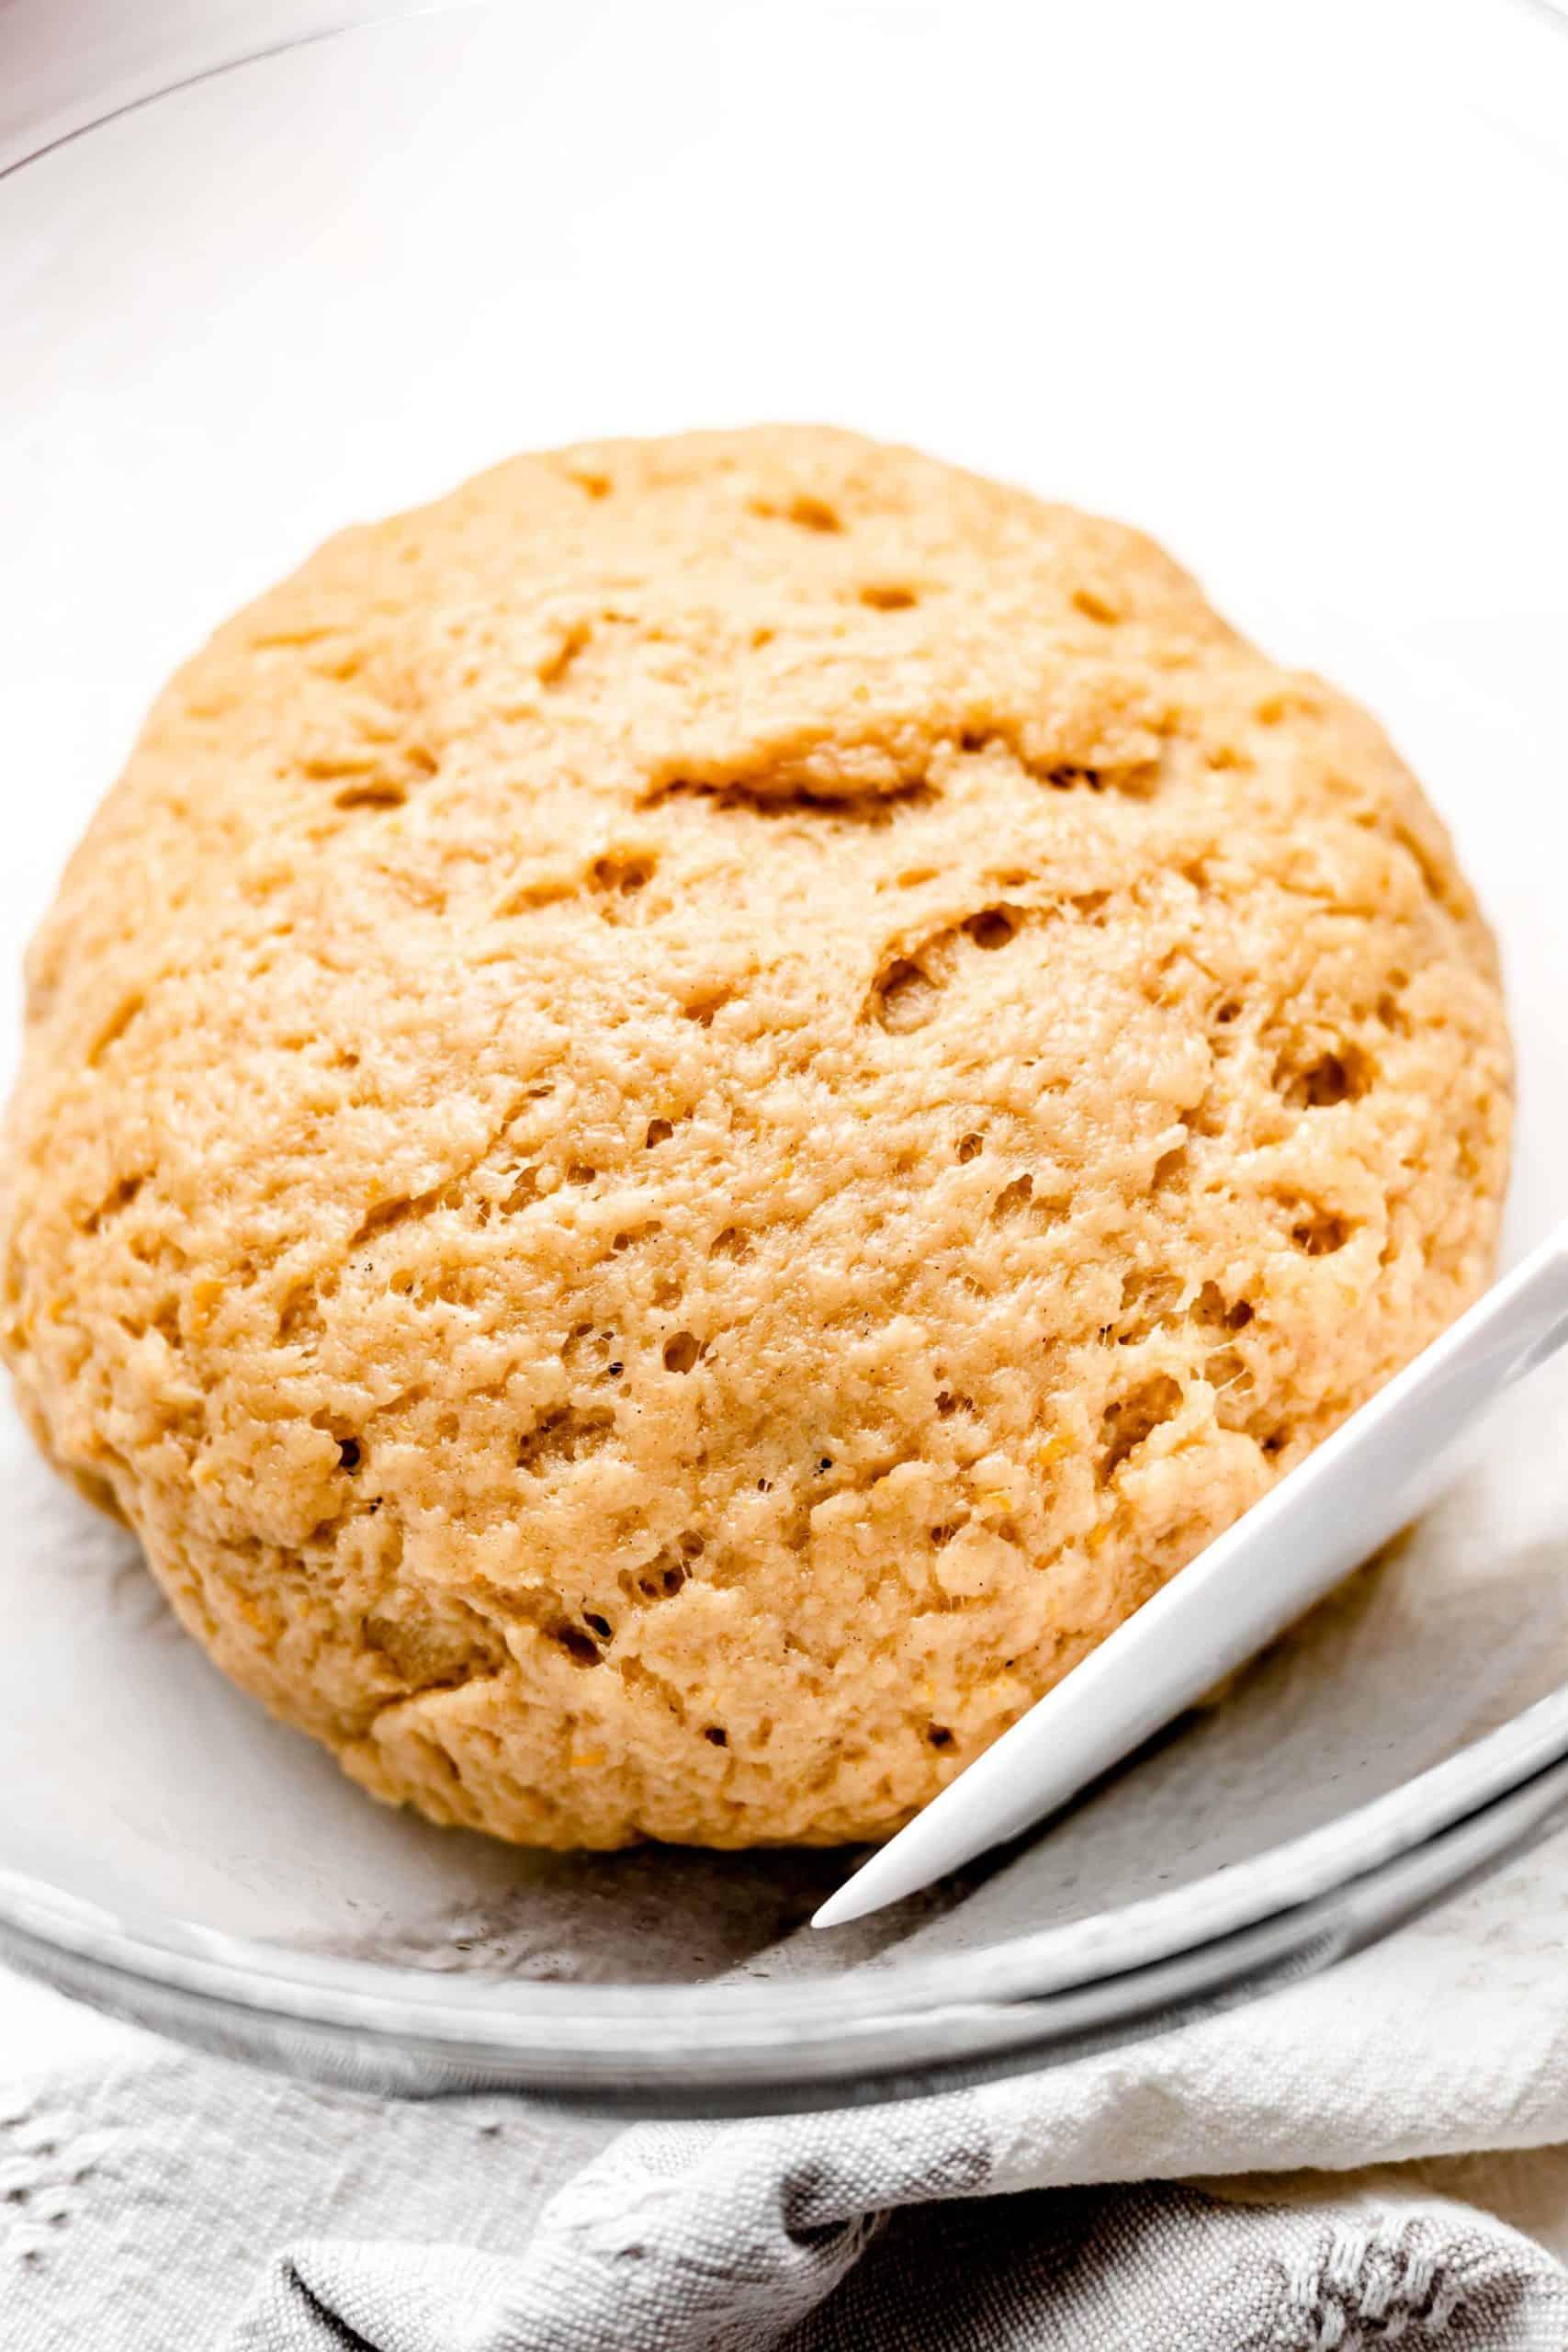 Greek olive oil cookie dough